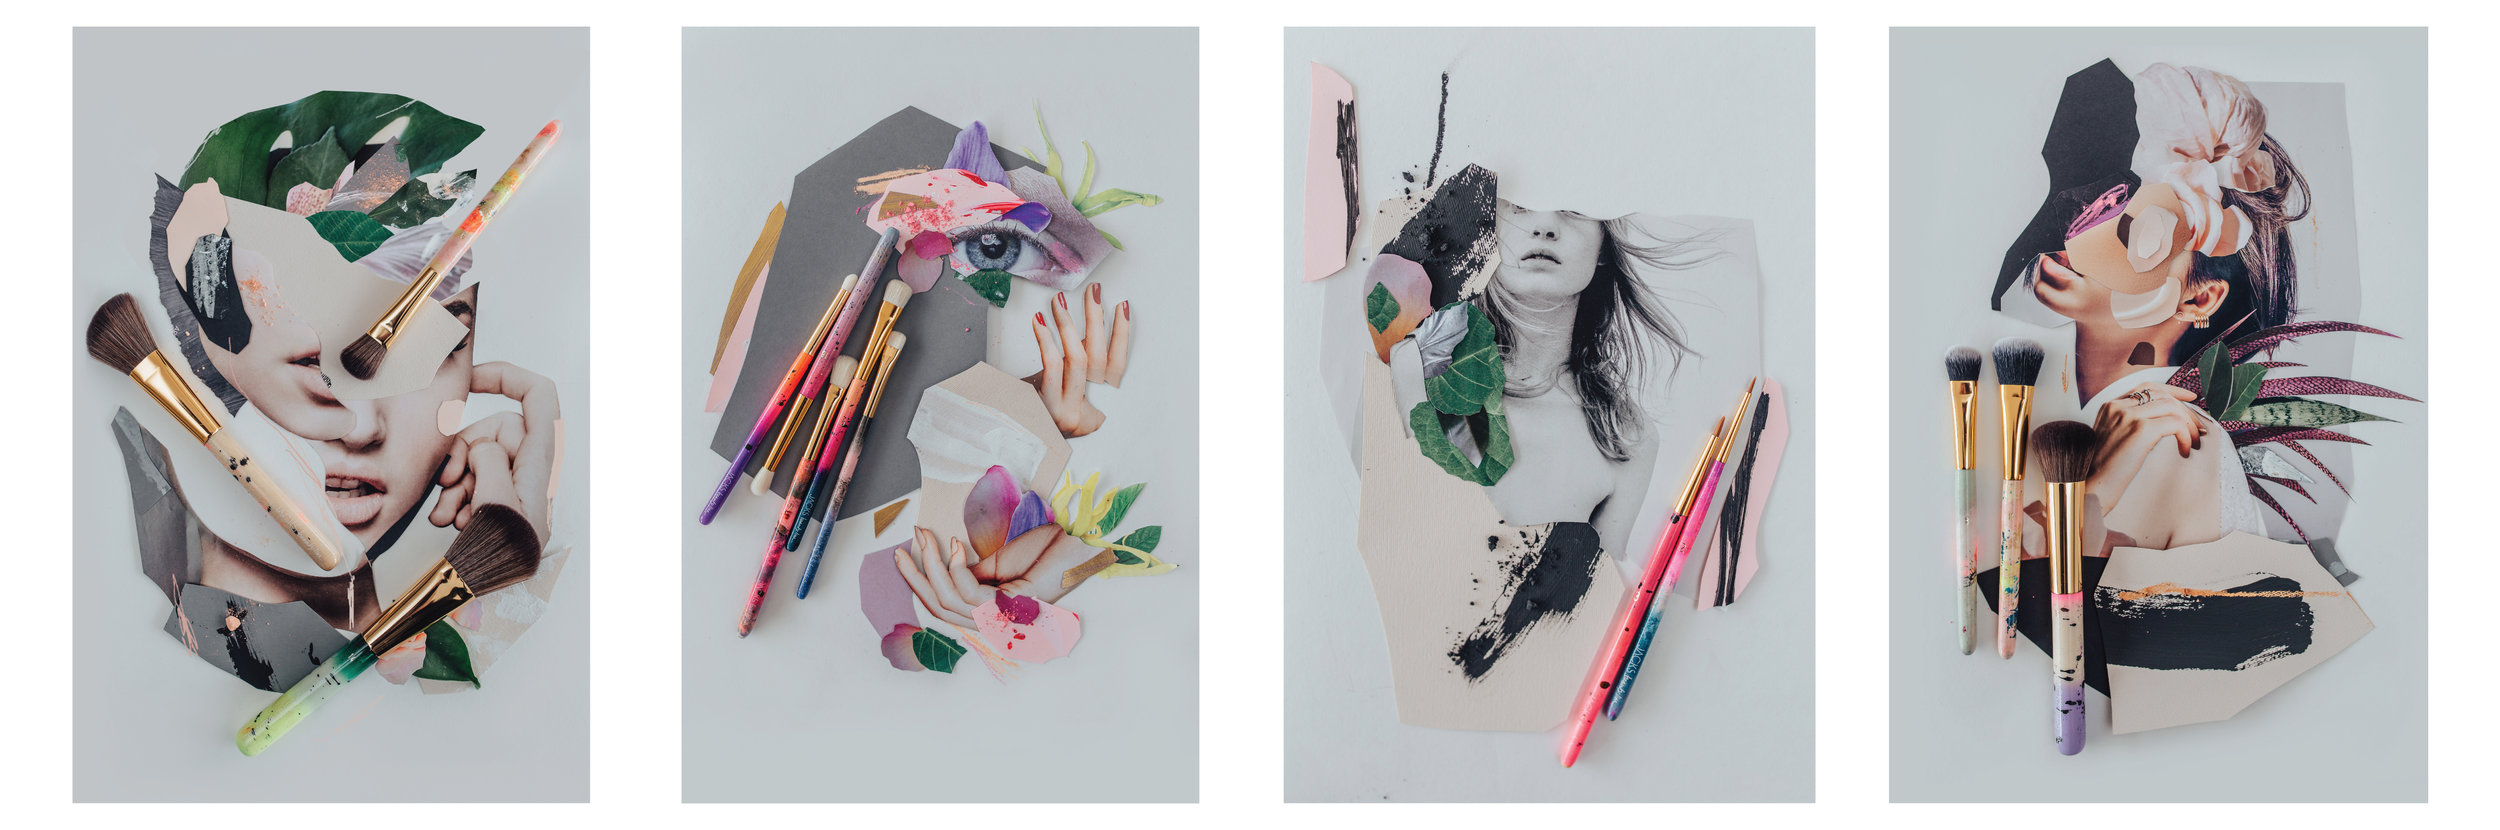 Kunst_Collagen_Egija_Zirapa